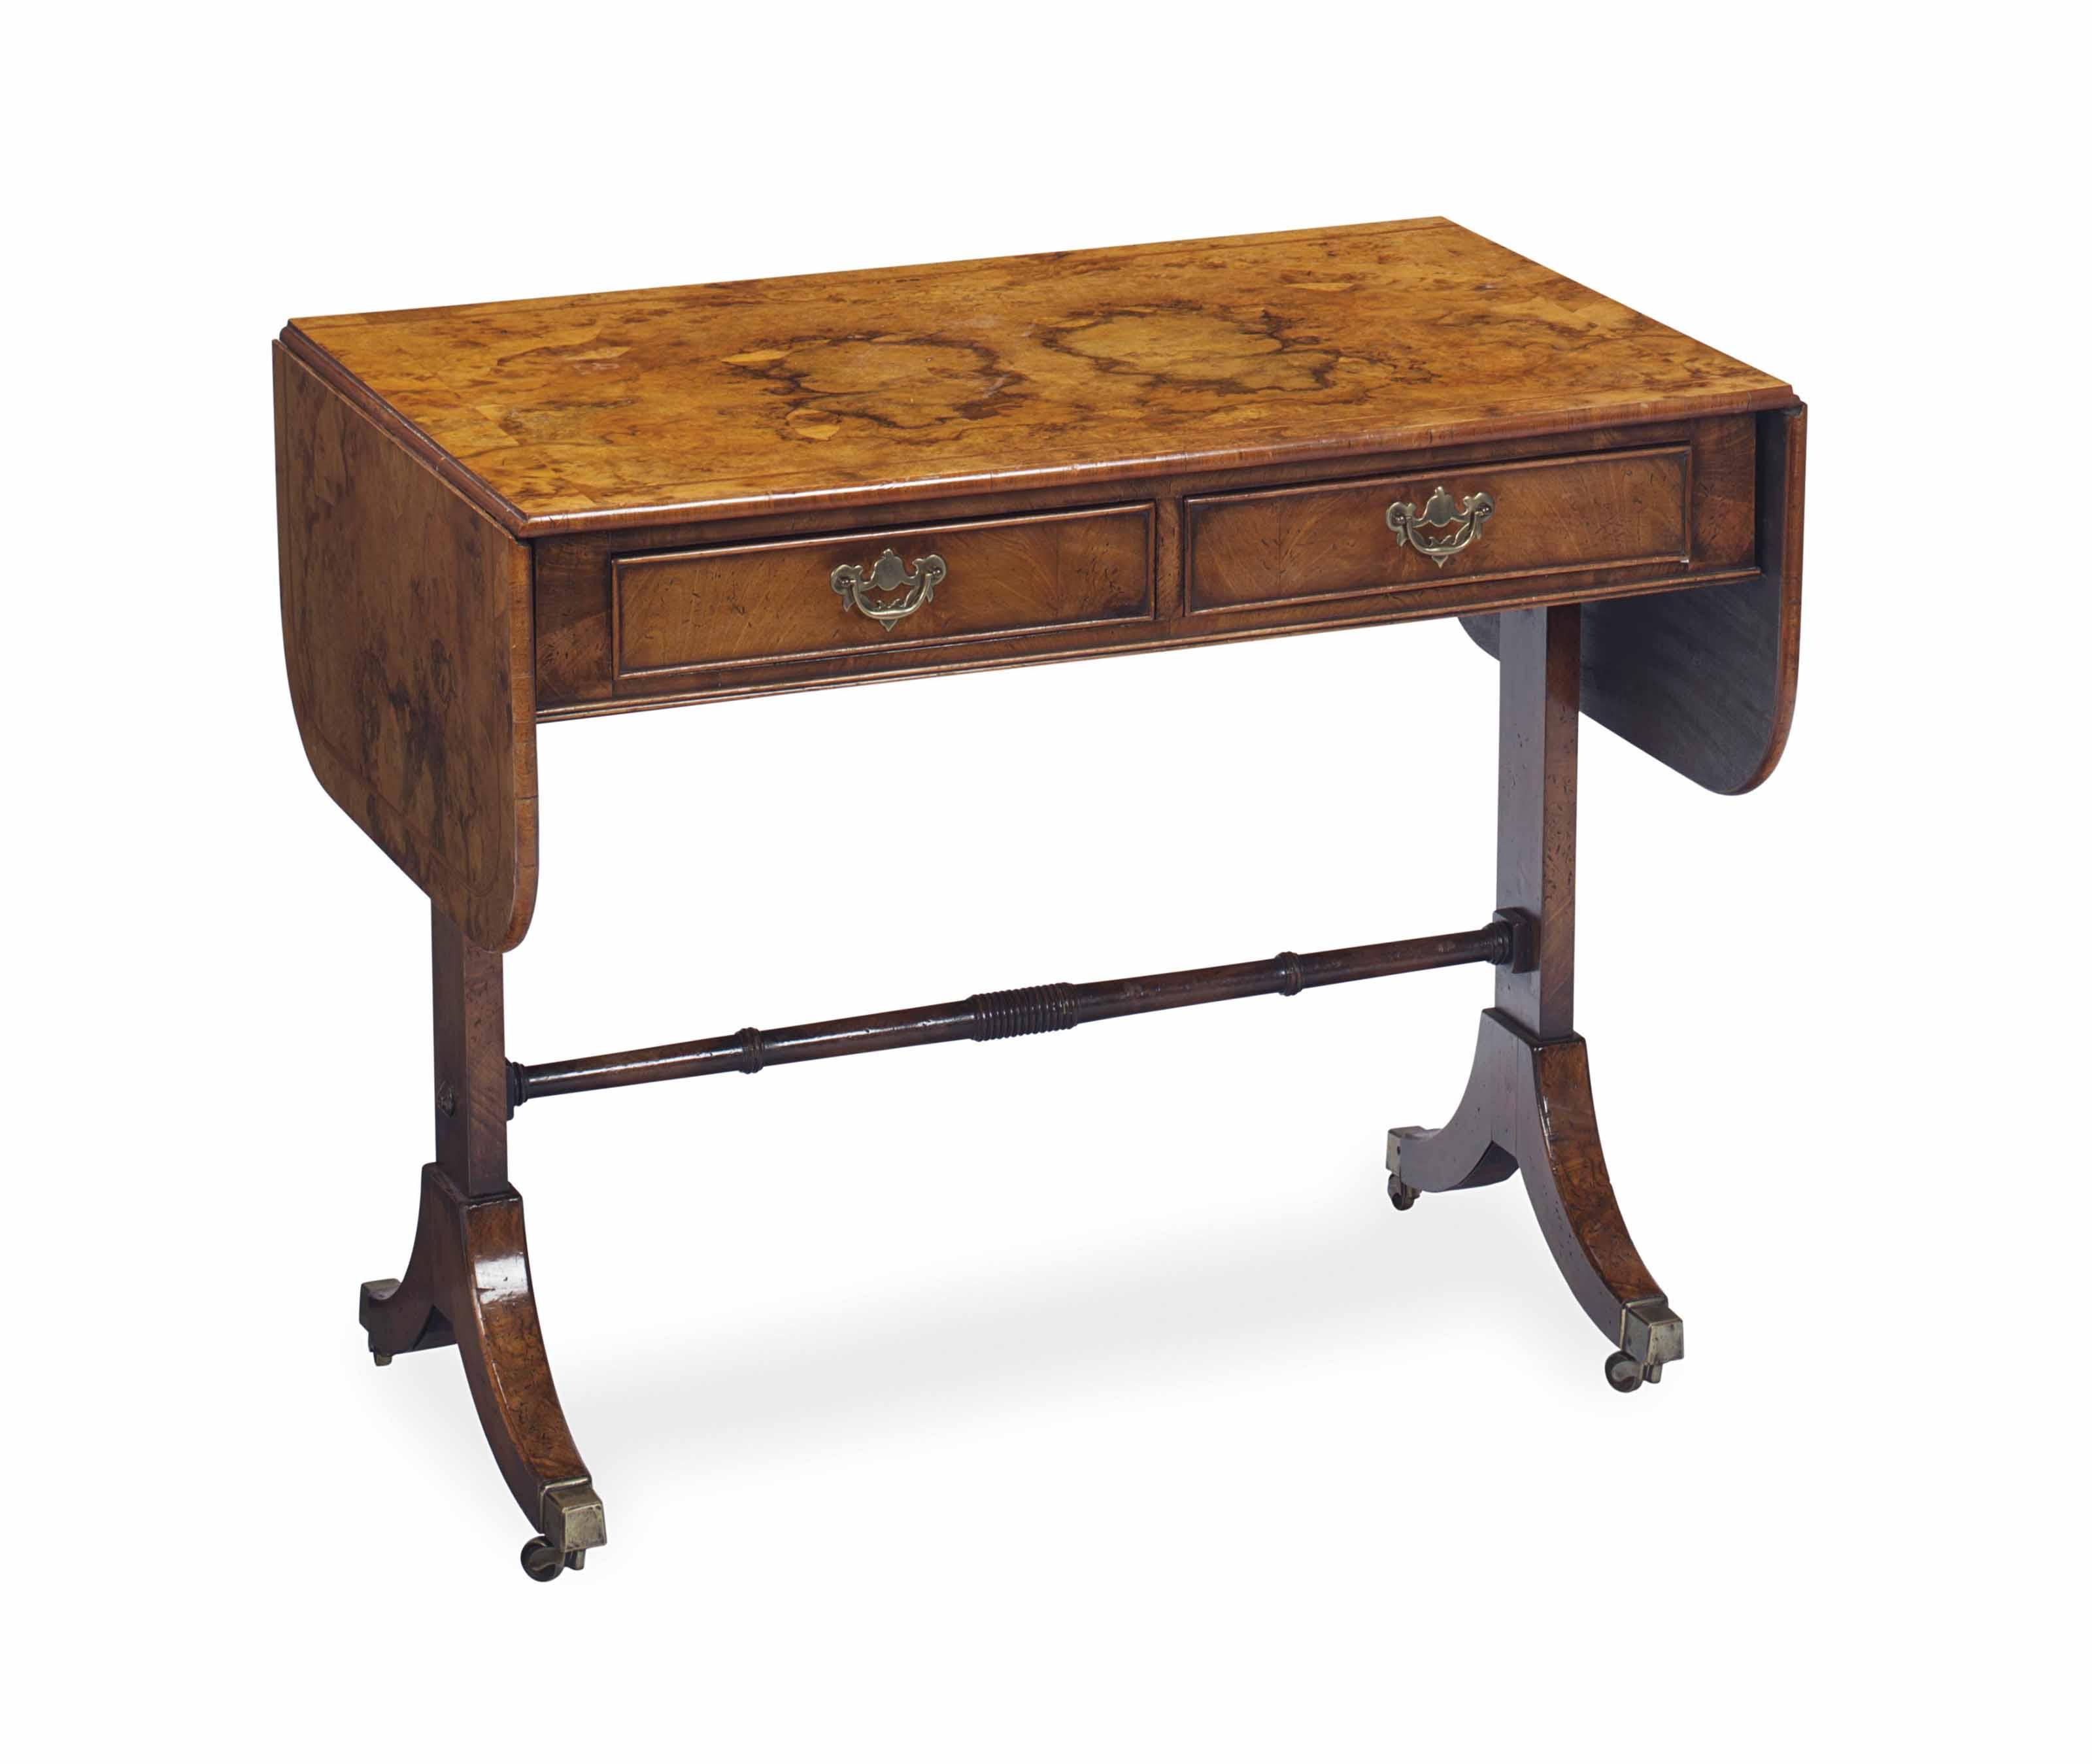 AN ENGLISH WALNUT SOFA TABLE,